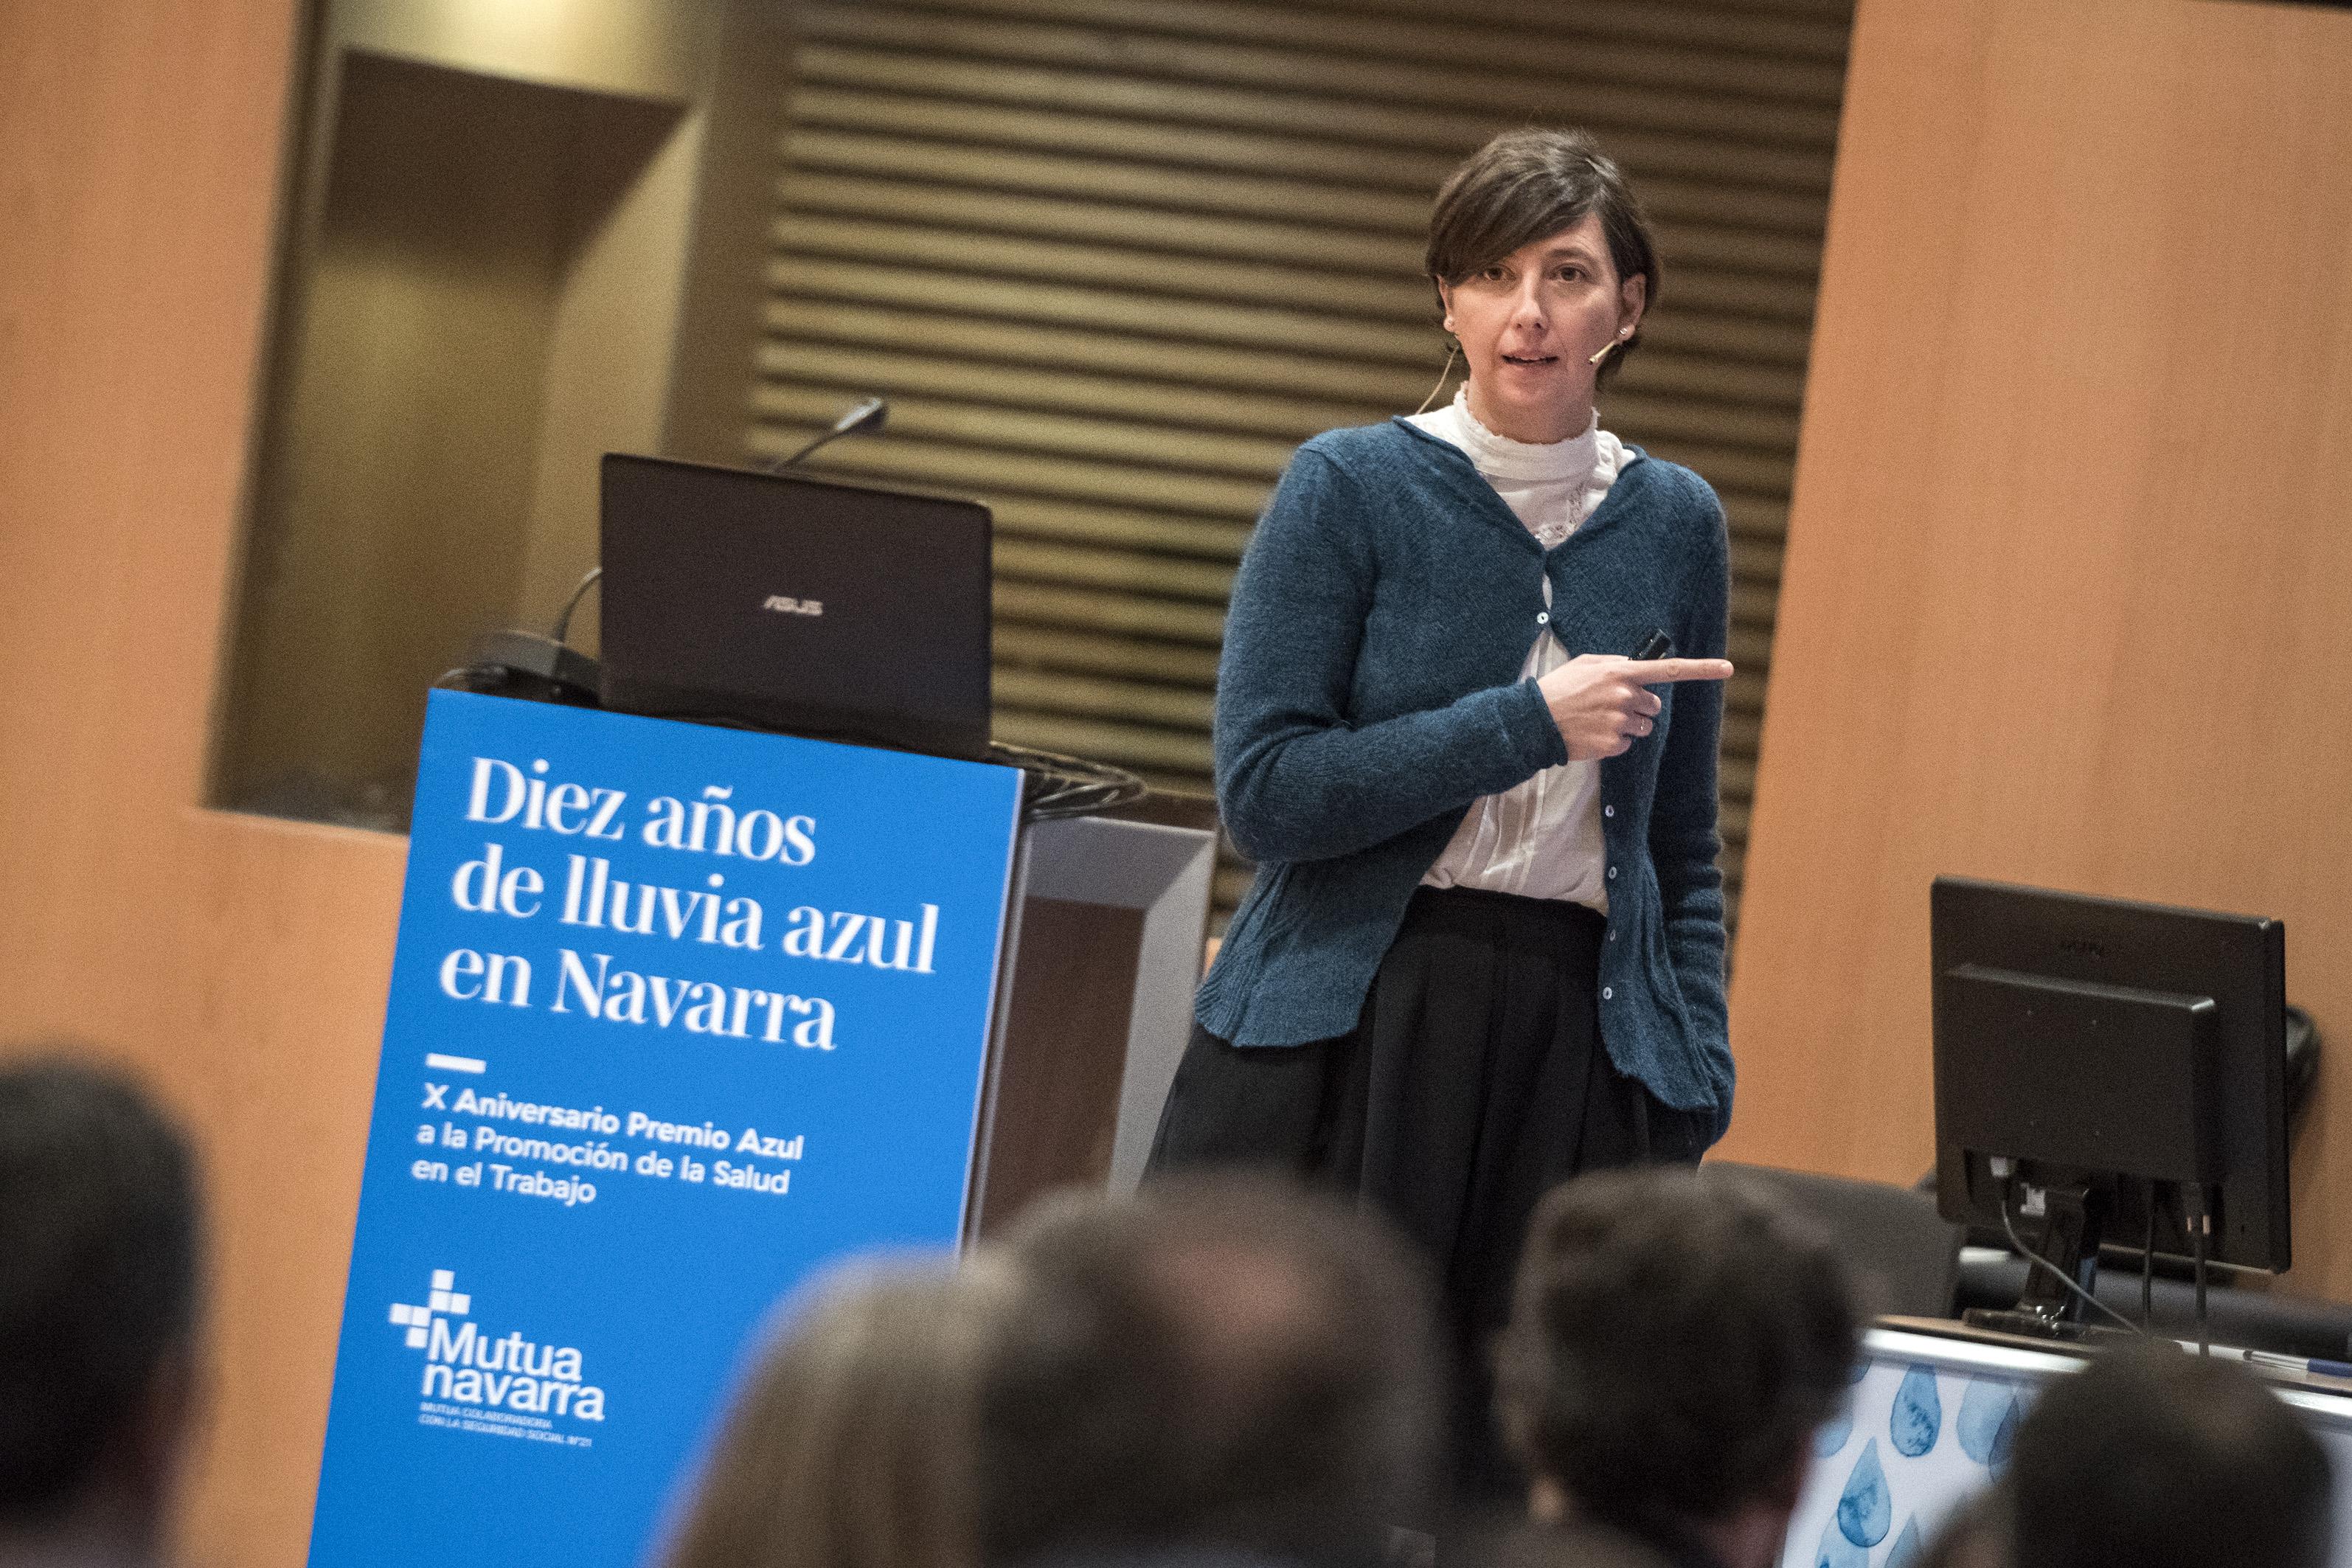 Mutua Navarra. Premio Azul, X Aniversario. Sala Luneta, Baluarte. 30.01.2019